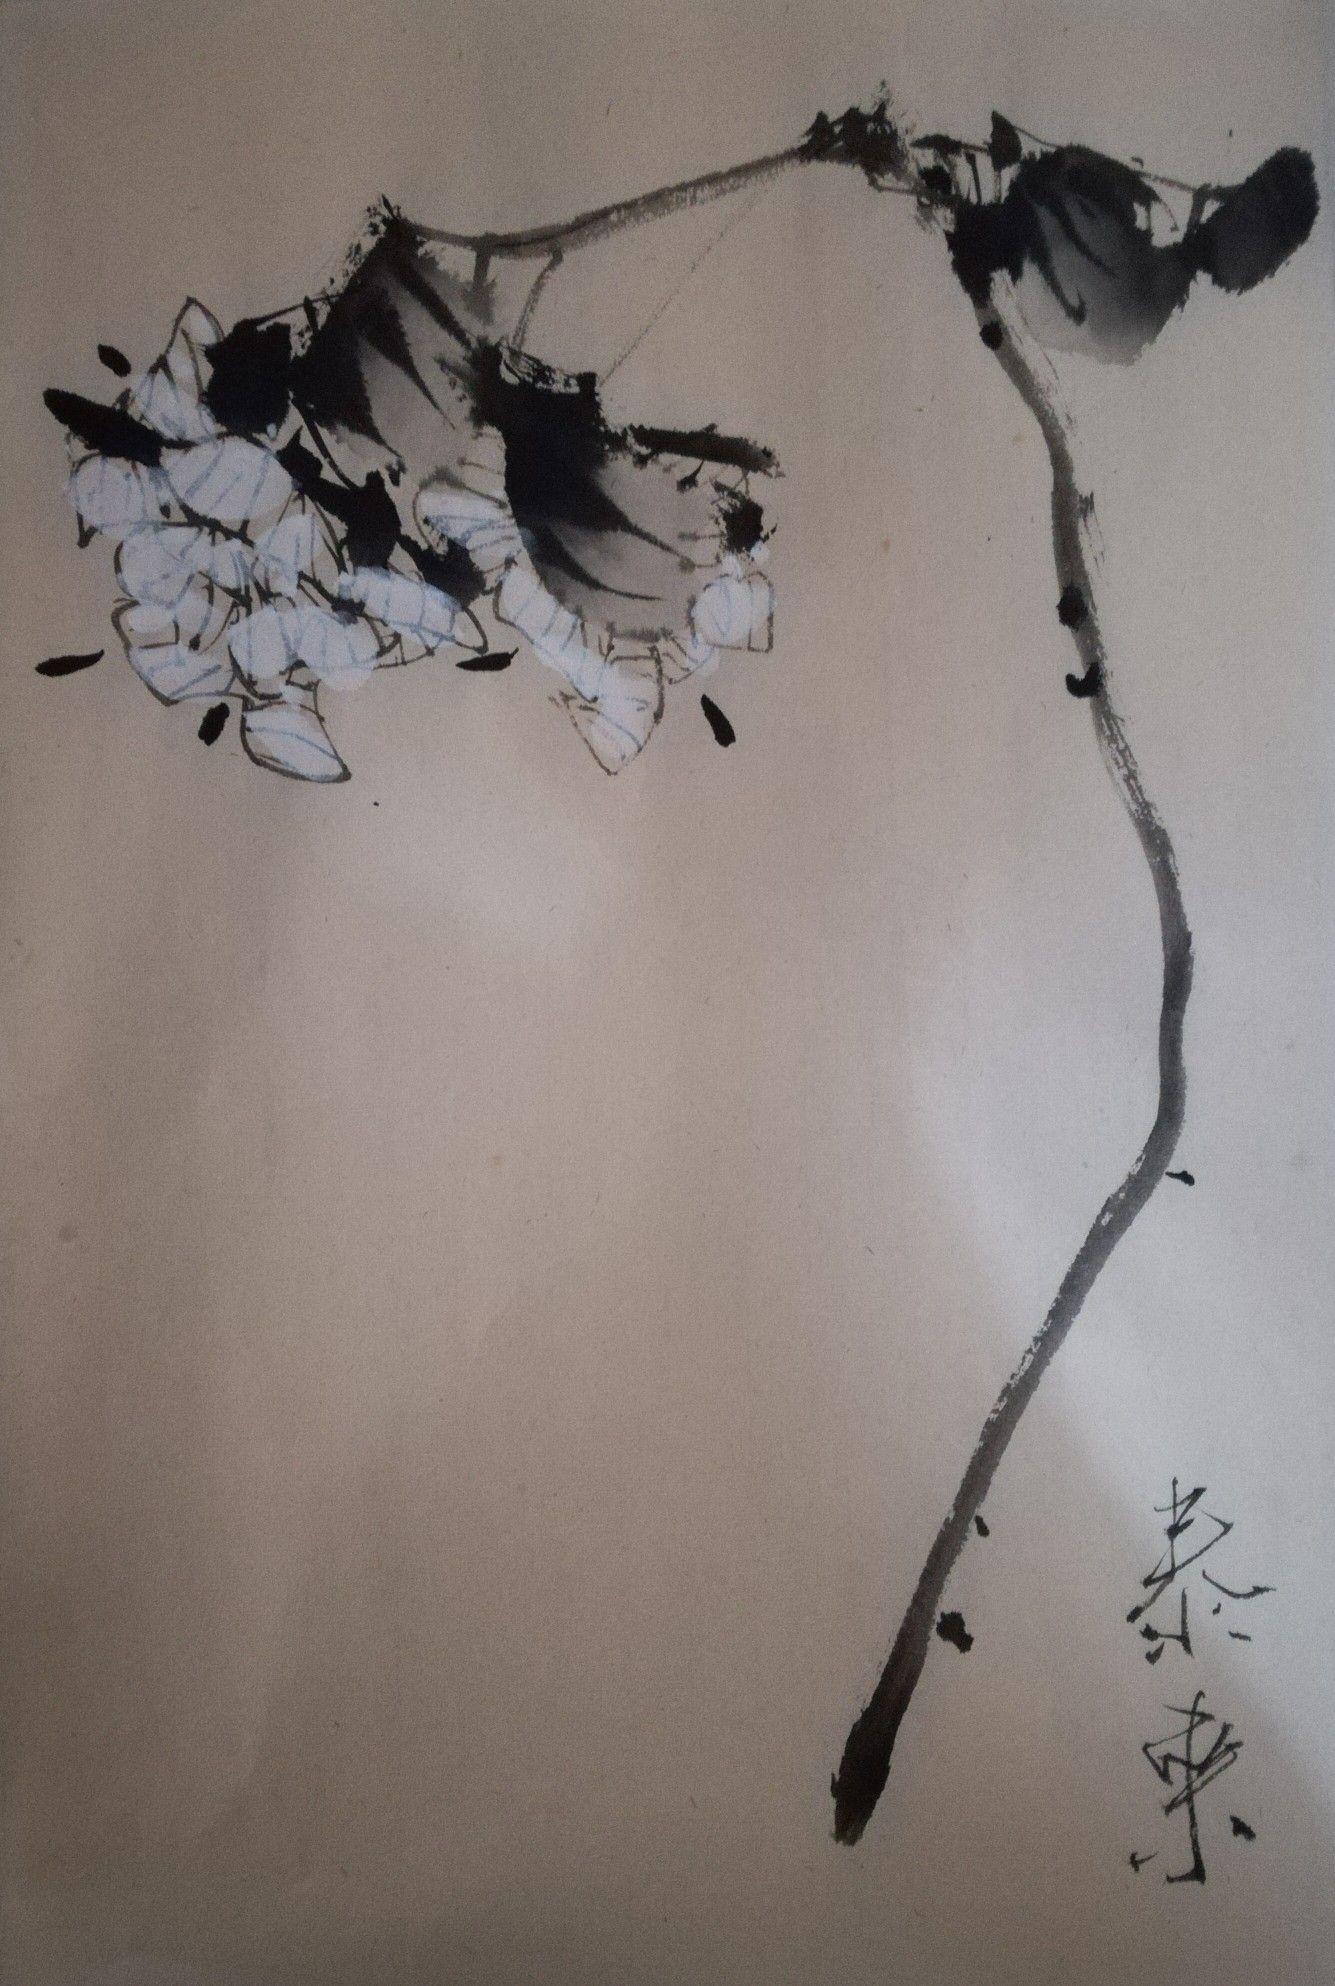 Chinesische Malerei Glanzender Mond Peng Guo Lan Xishi De